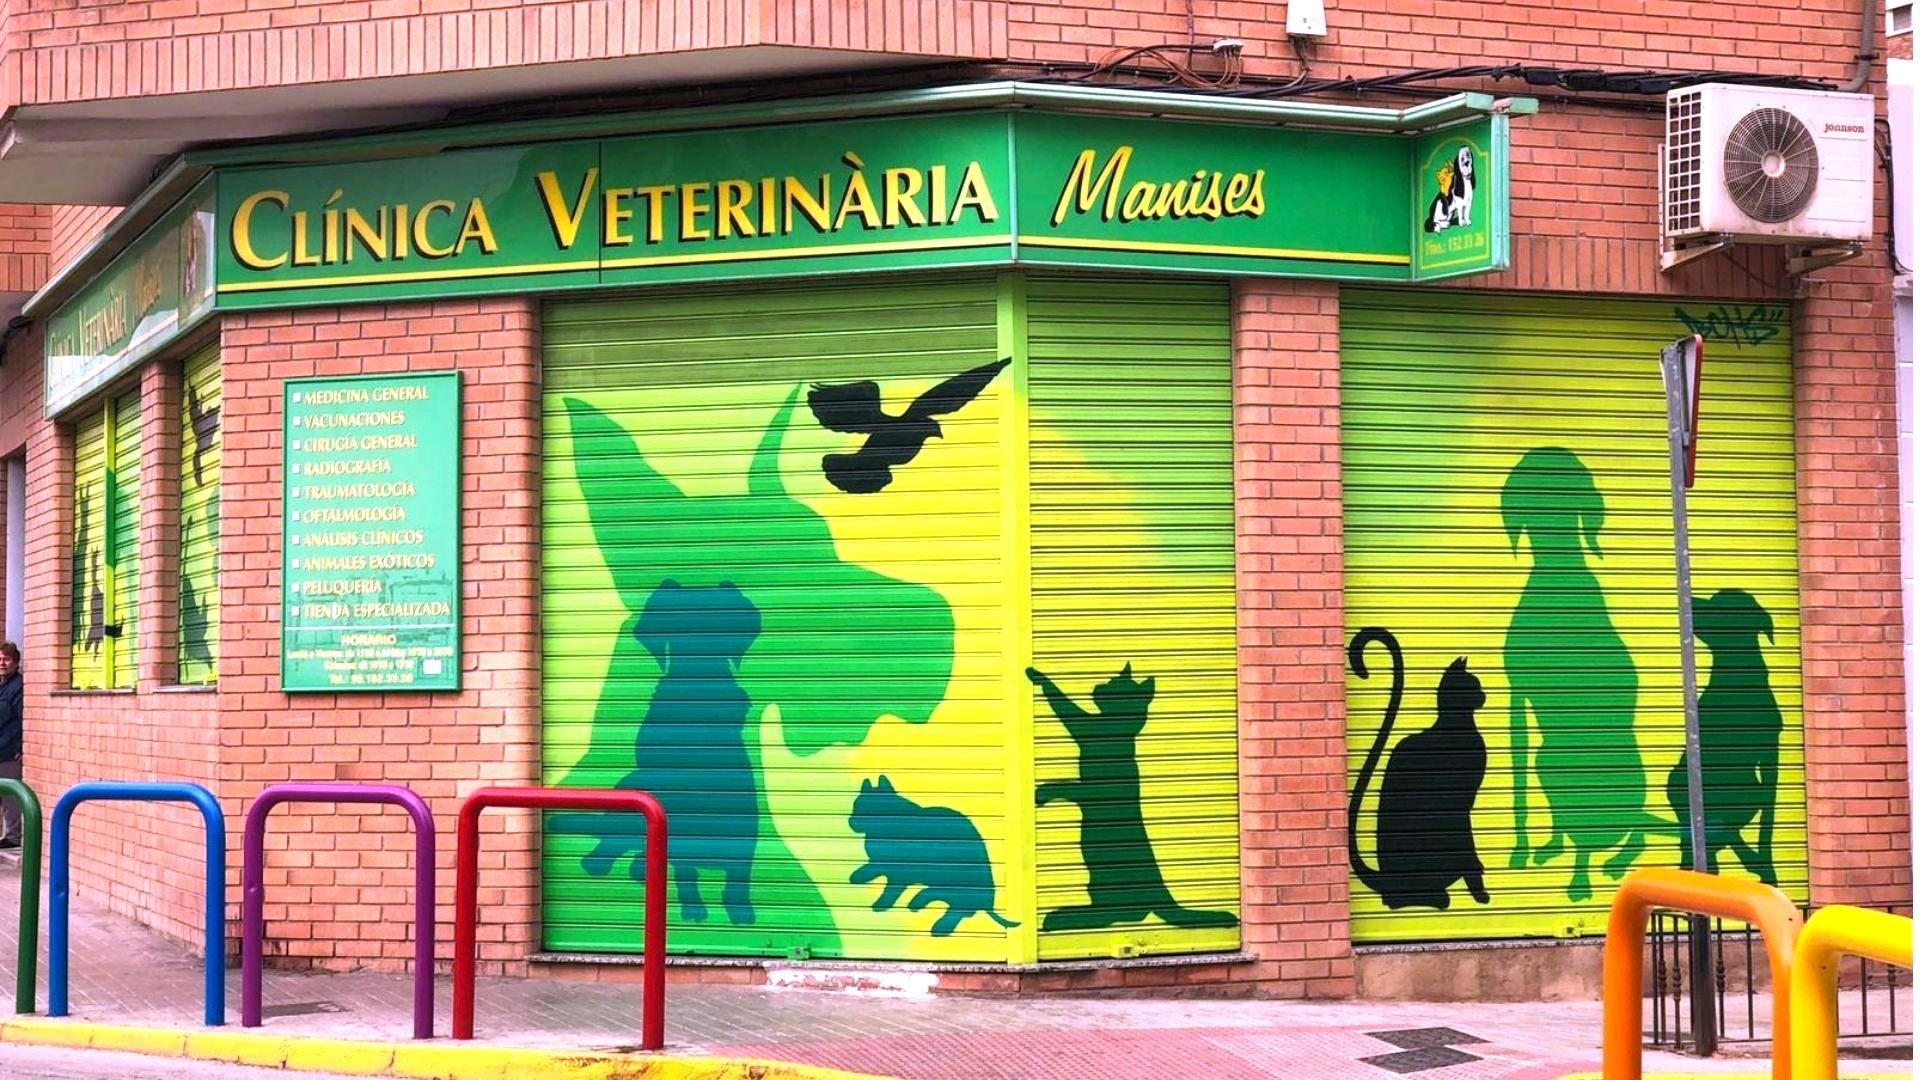 Clínica veterinaria en Manises